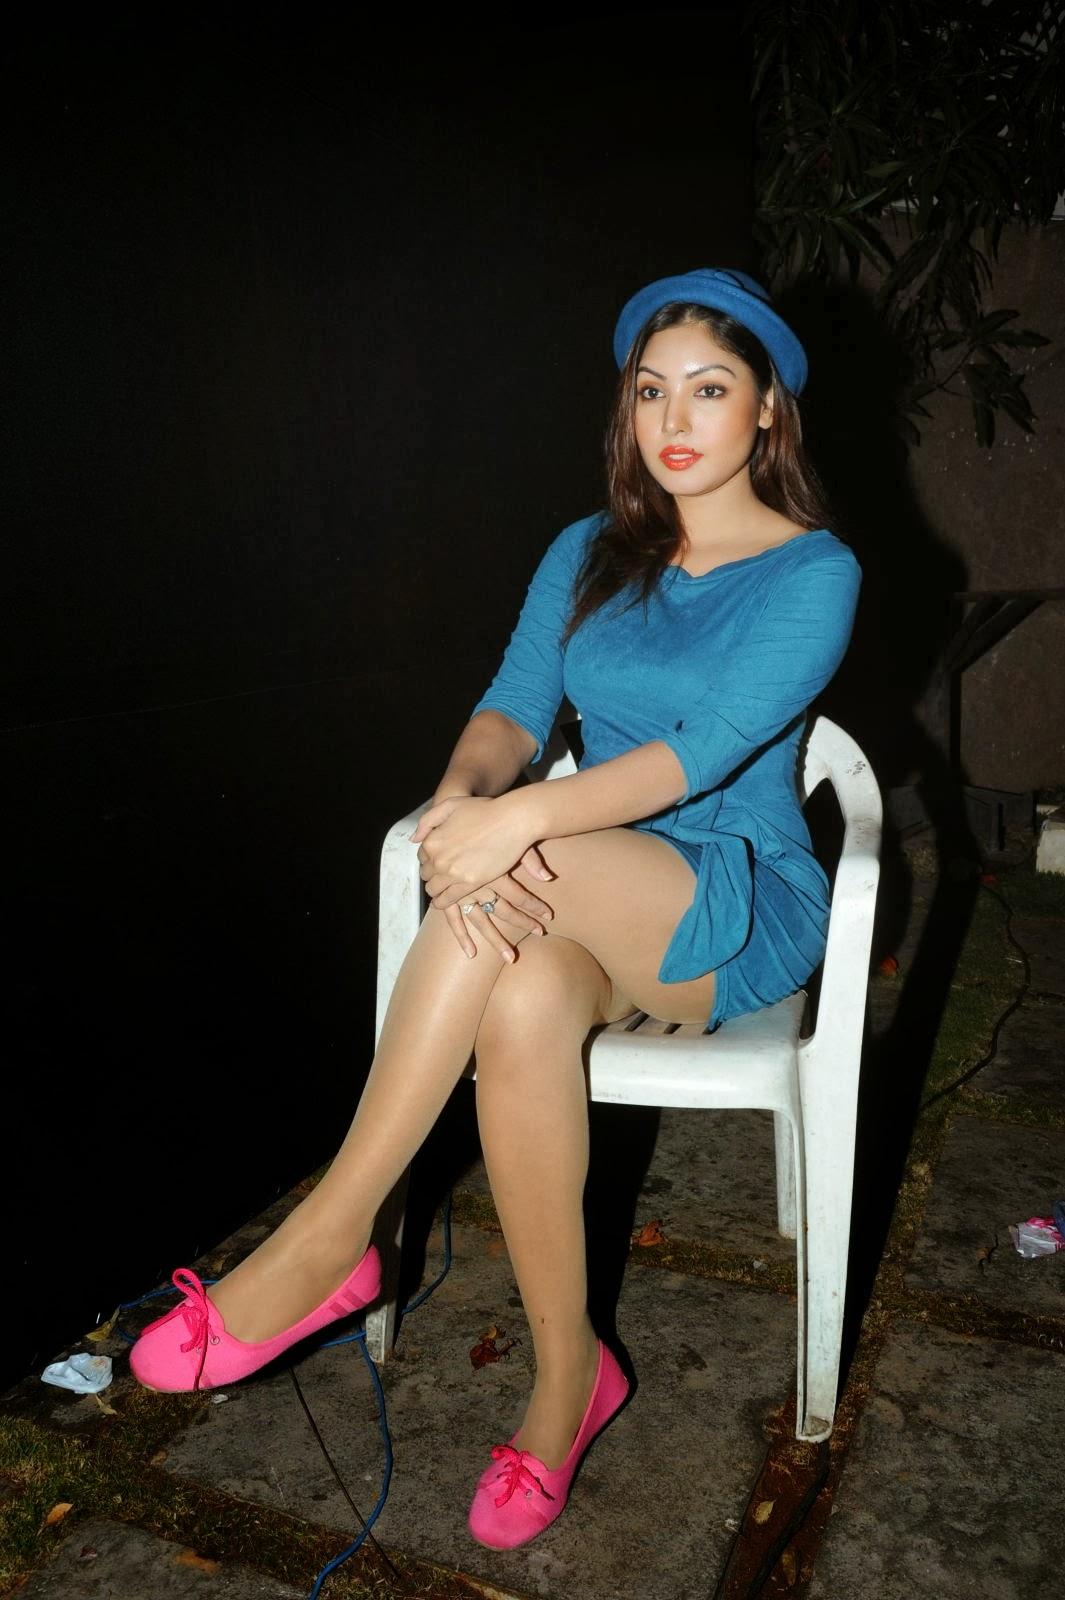 Lia Marie Johnson Latest Hd Swimsuit Photoshoot - Sab Ka Mann